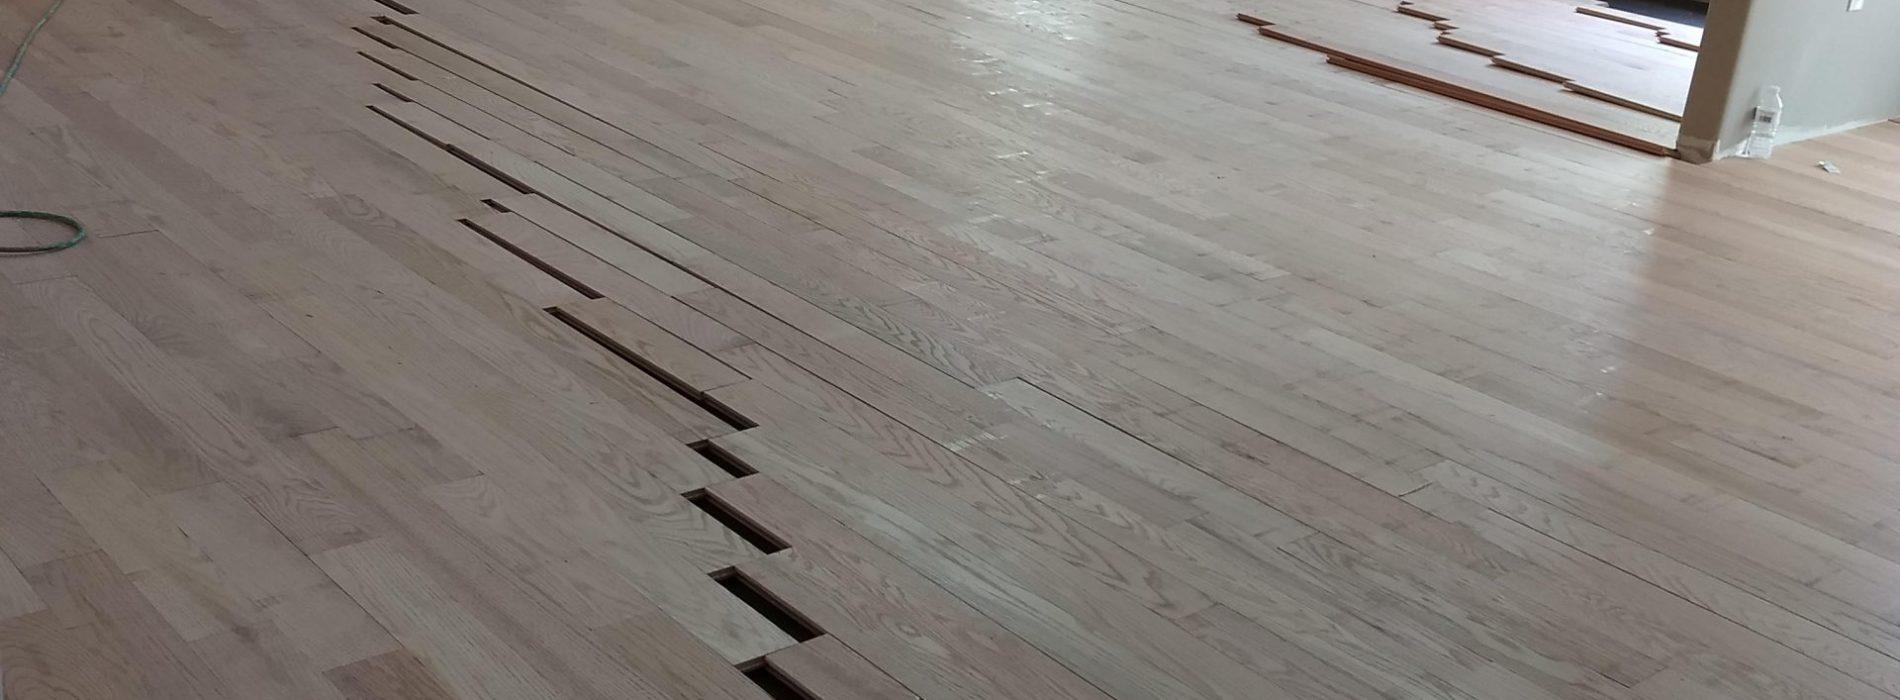 replacing wood flooring in main living area